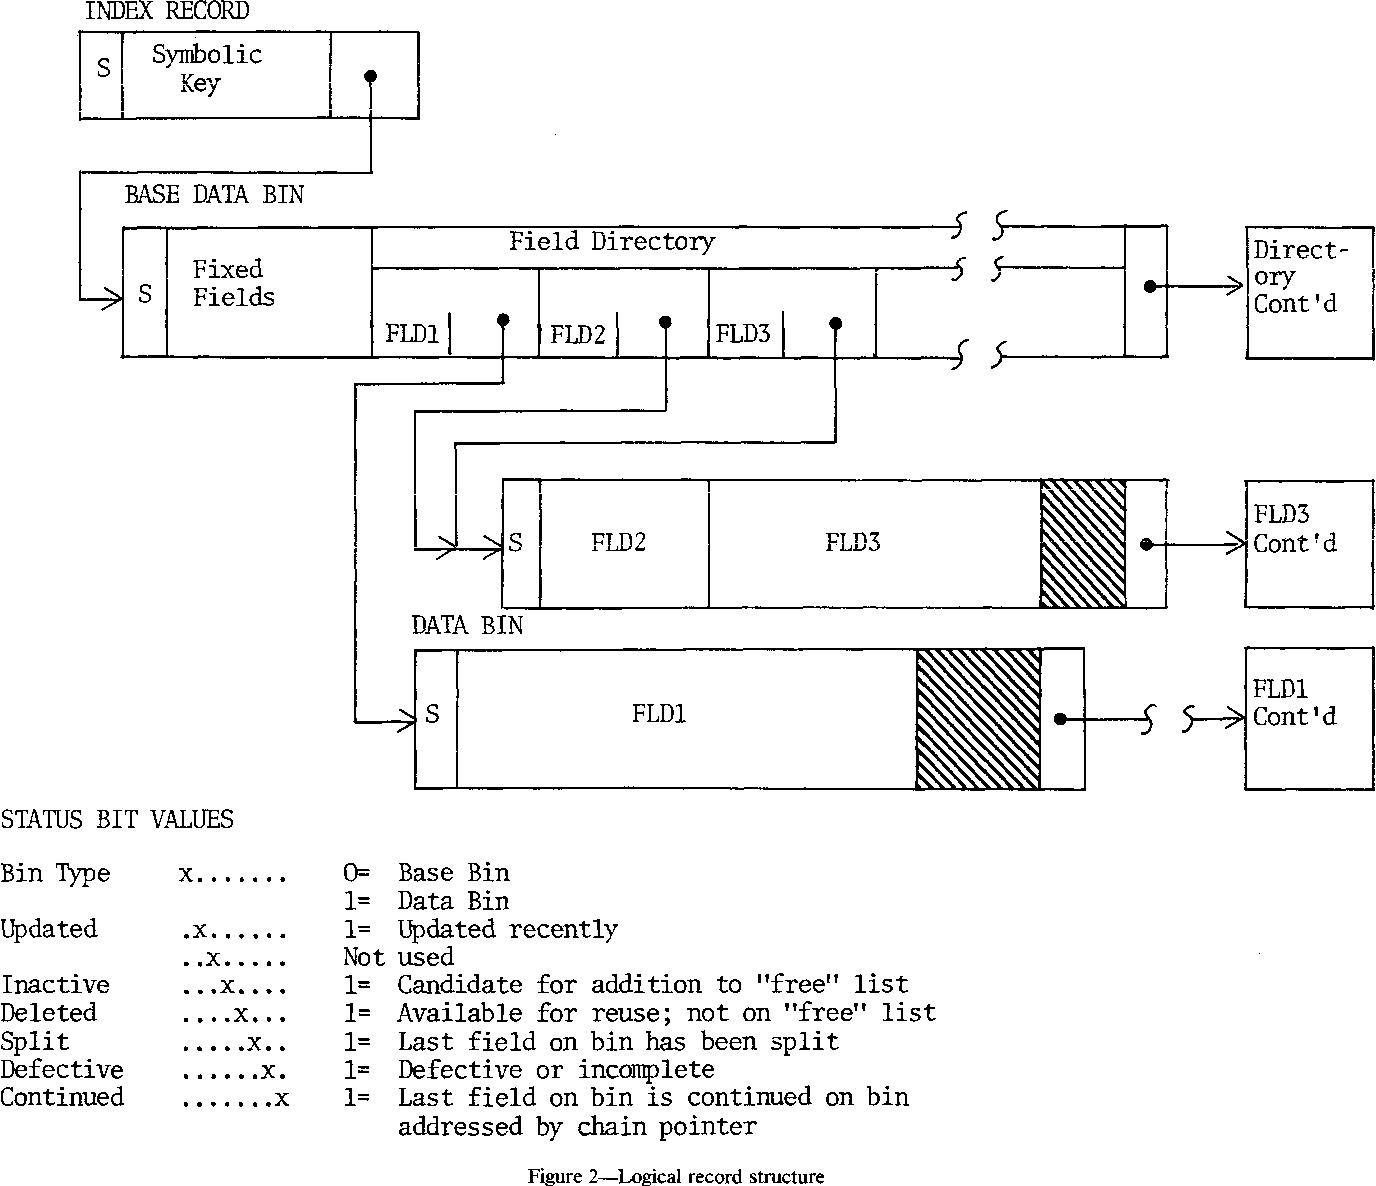 Ory Circuit Diagram Continued - Wiring Diagram Data SCHEMA on eric clapton wiring diagram, ssv wiring diagram, spa wiring diagram, ssl wiring diagram, loc wiring diagram, key wiring diagram, spi wiring diagram, sti wiring diagram, van halen wiring diagram, stc wiring diagram, arc wiring diagram, skf wiring diagram,